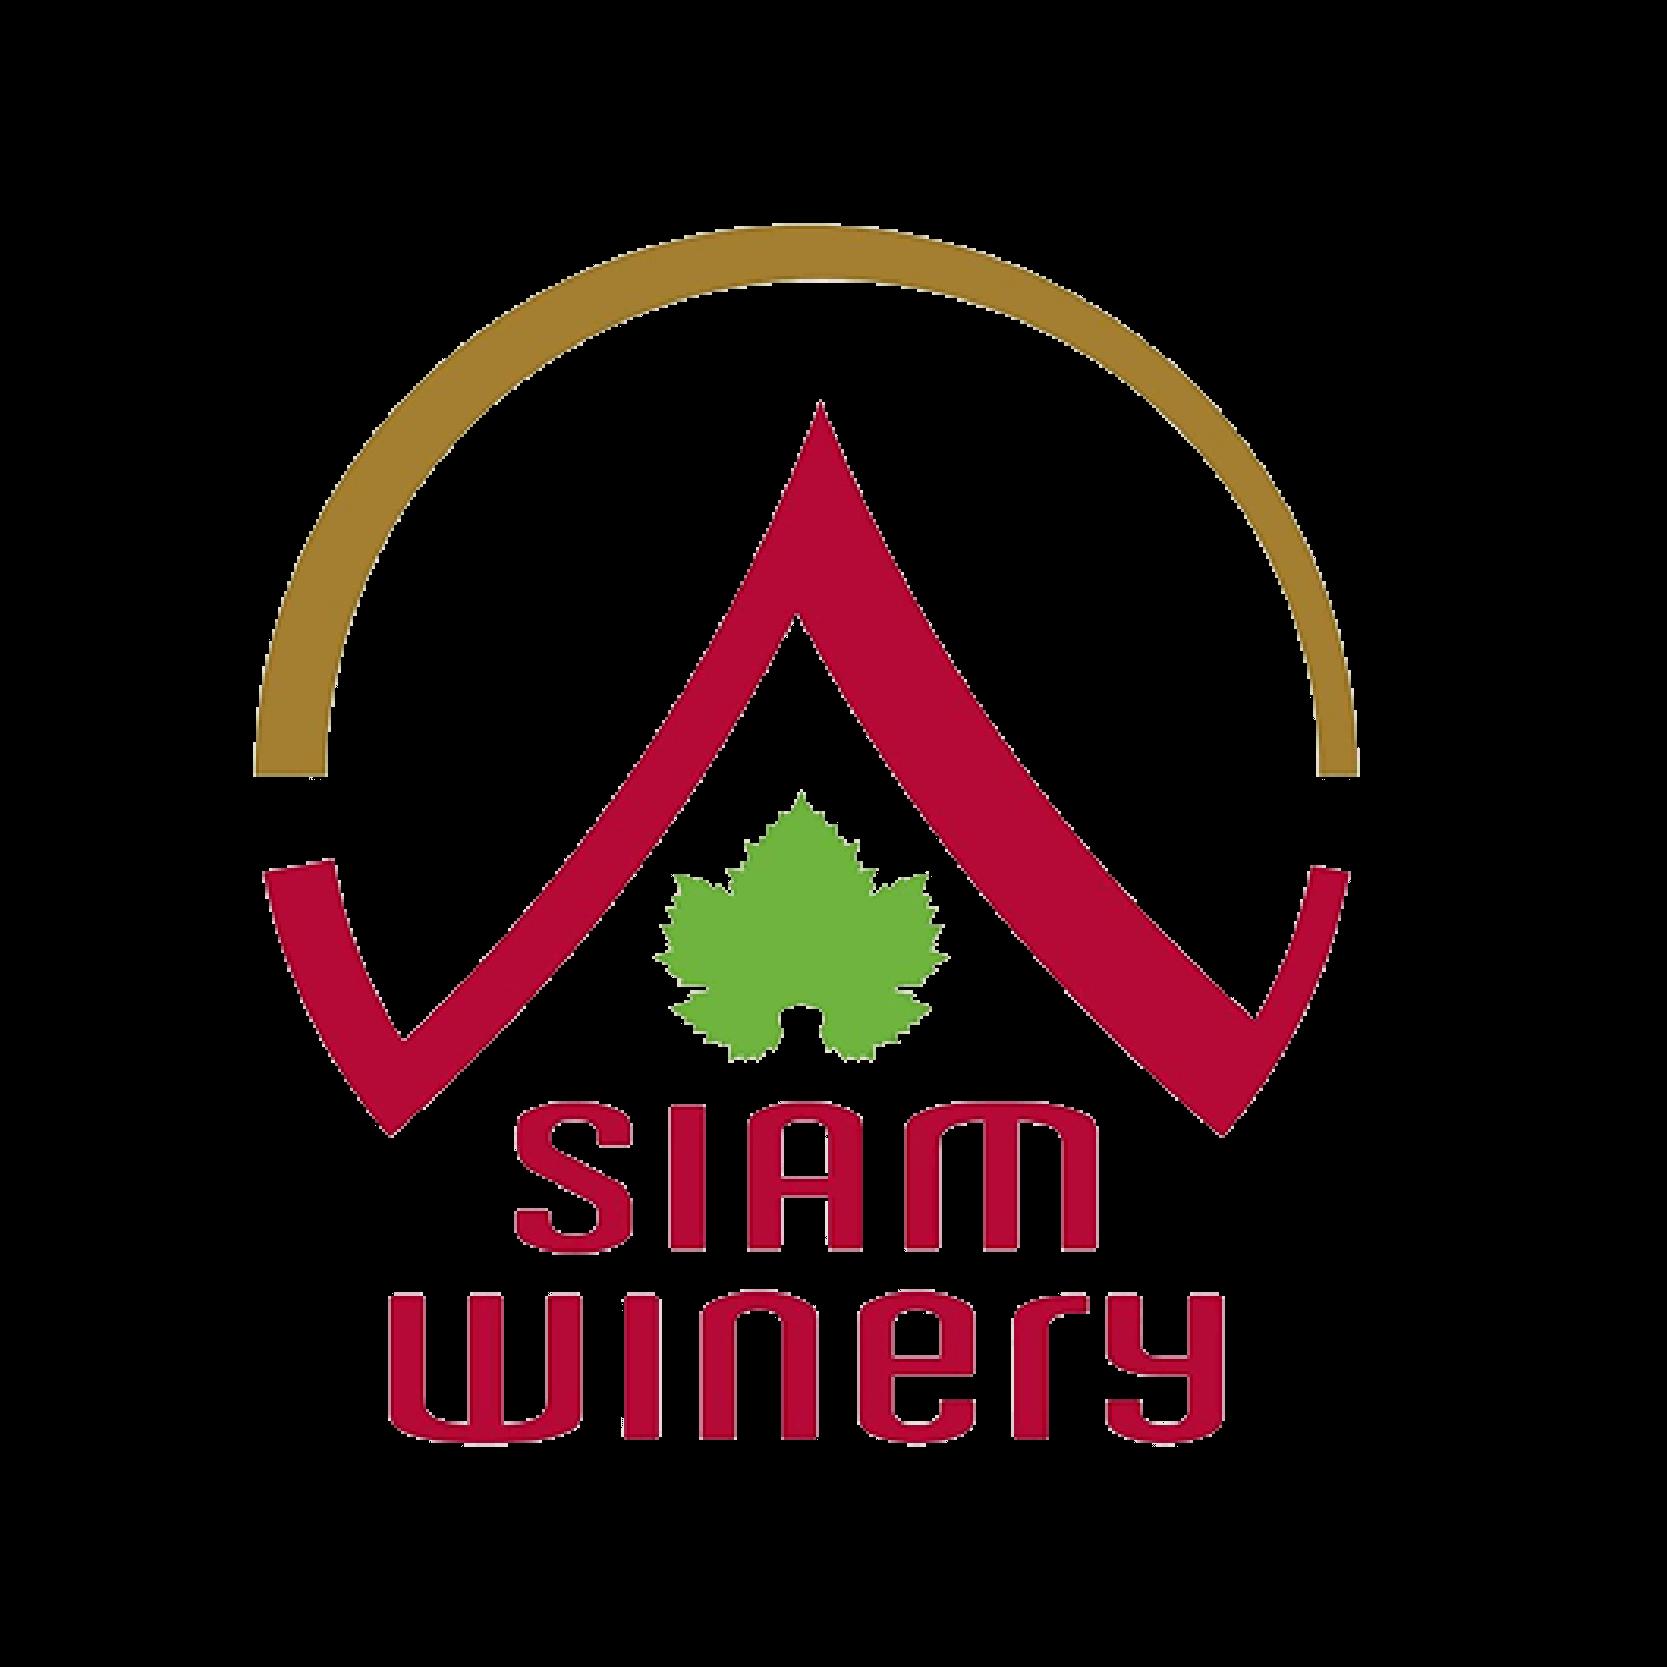 SIAM WINERY